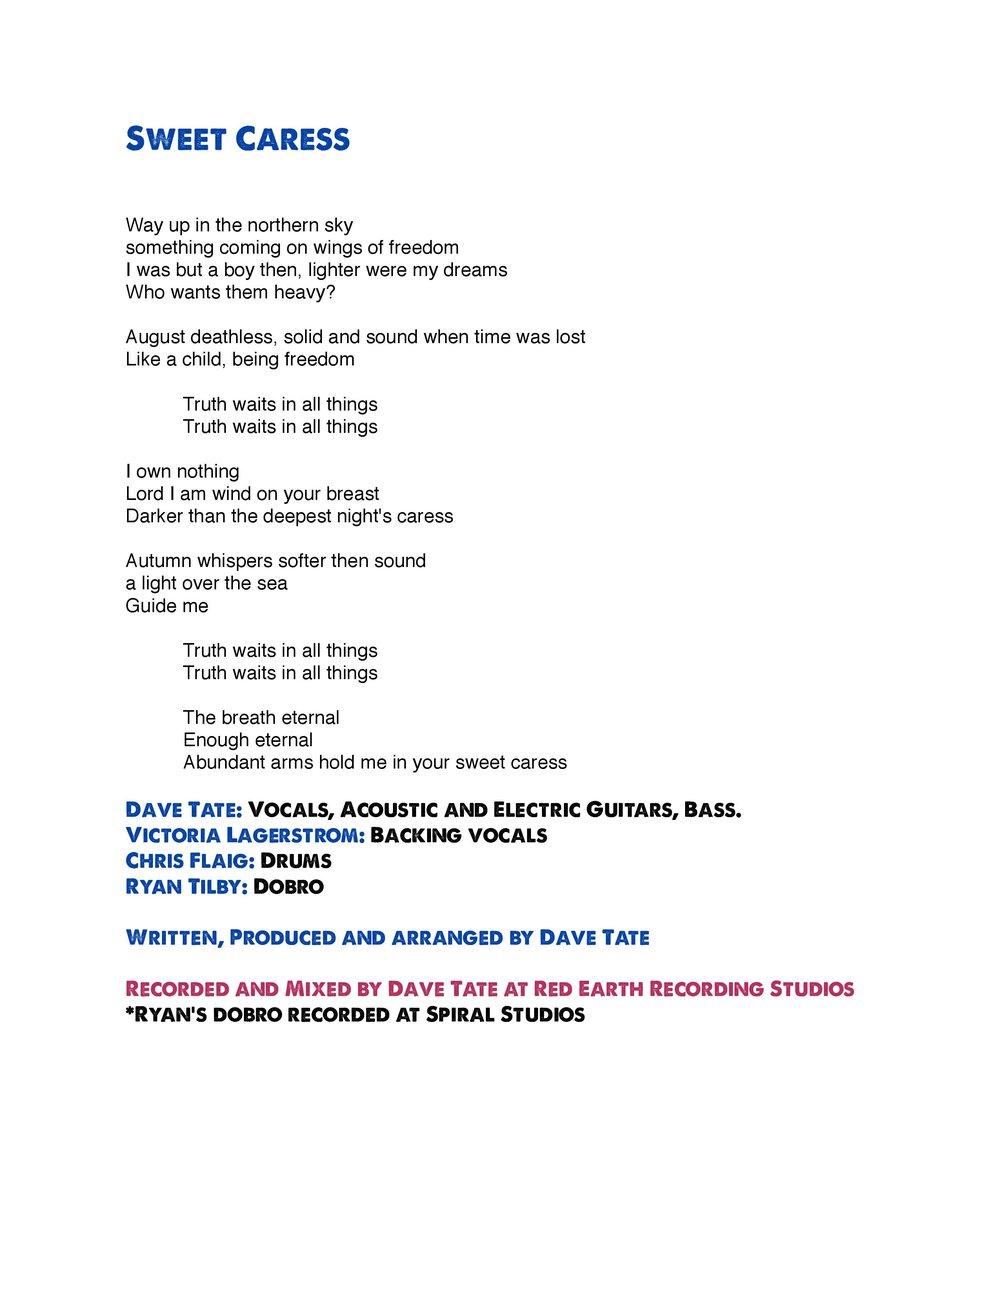 7 Sweet Caress Lyrics-page-001.jpg